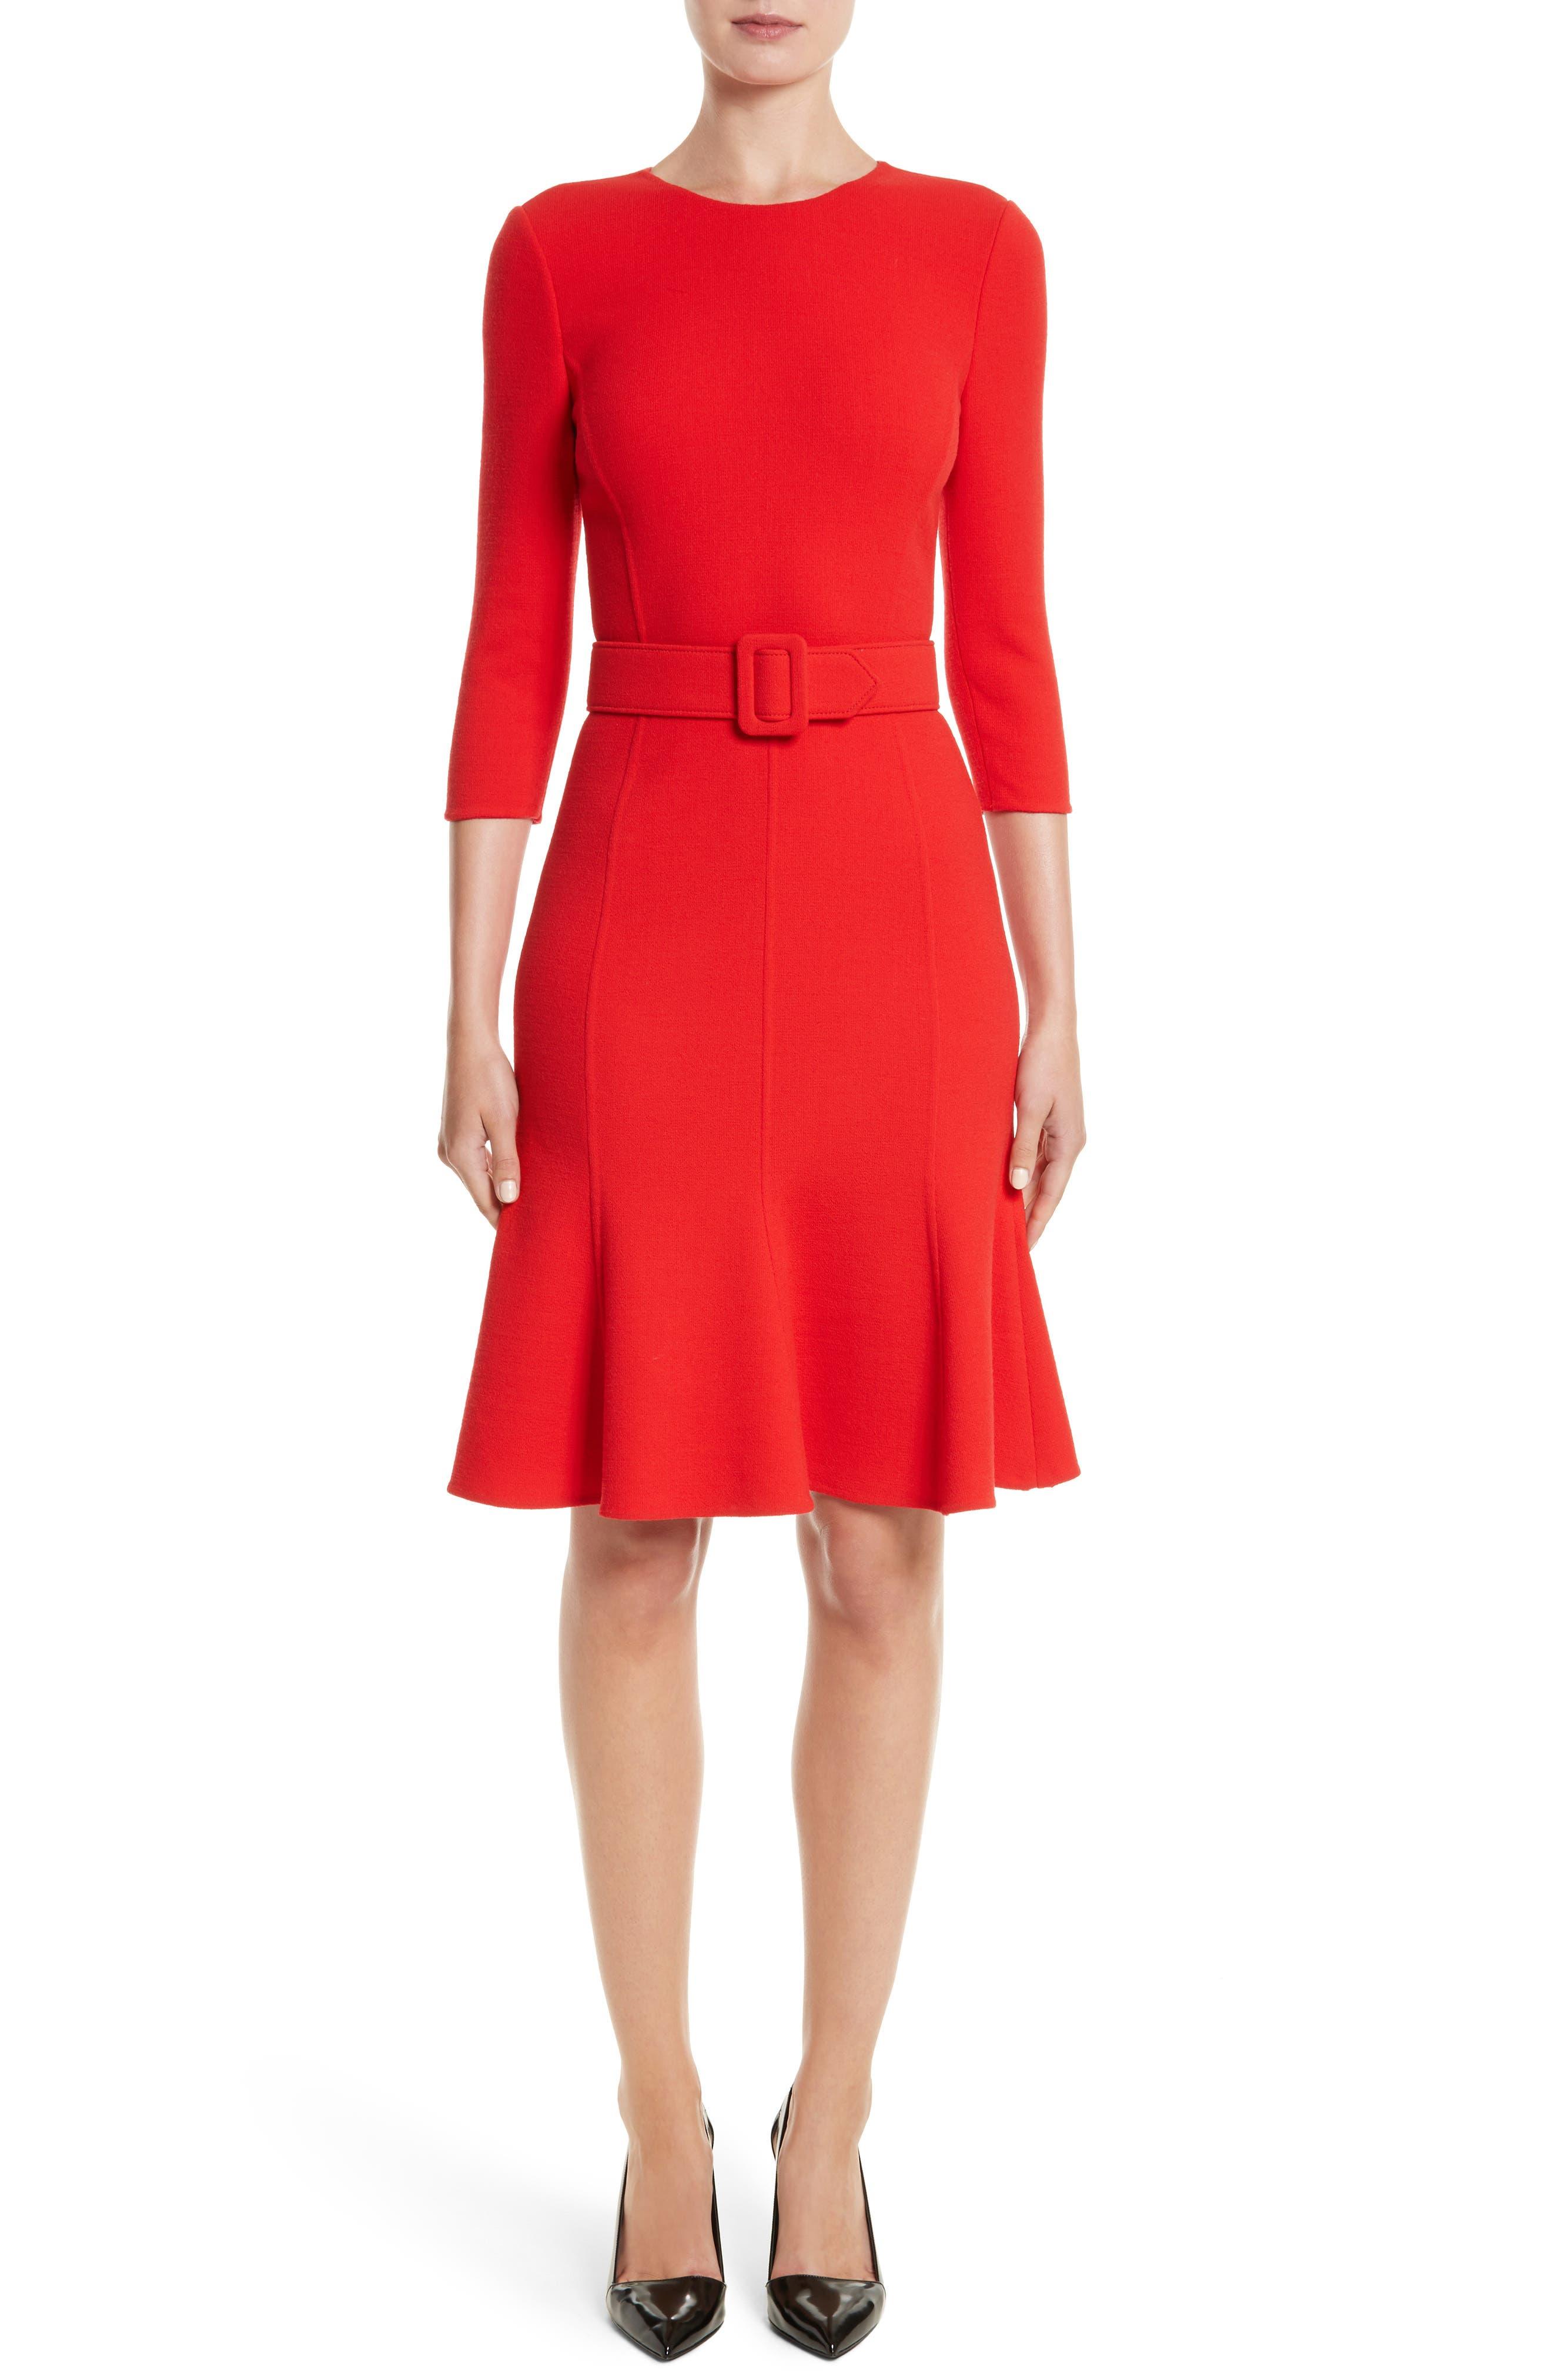 Alternate Image 1 Selected - Oscar de la Renta Crepe Fit & Flare Dress